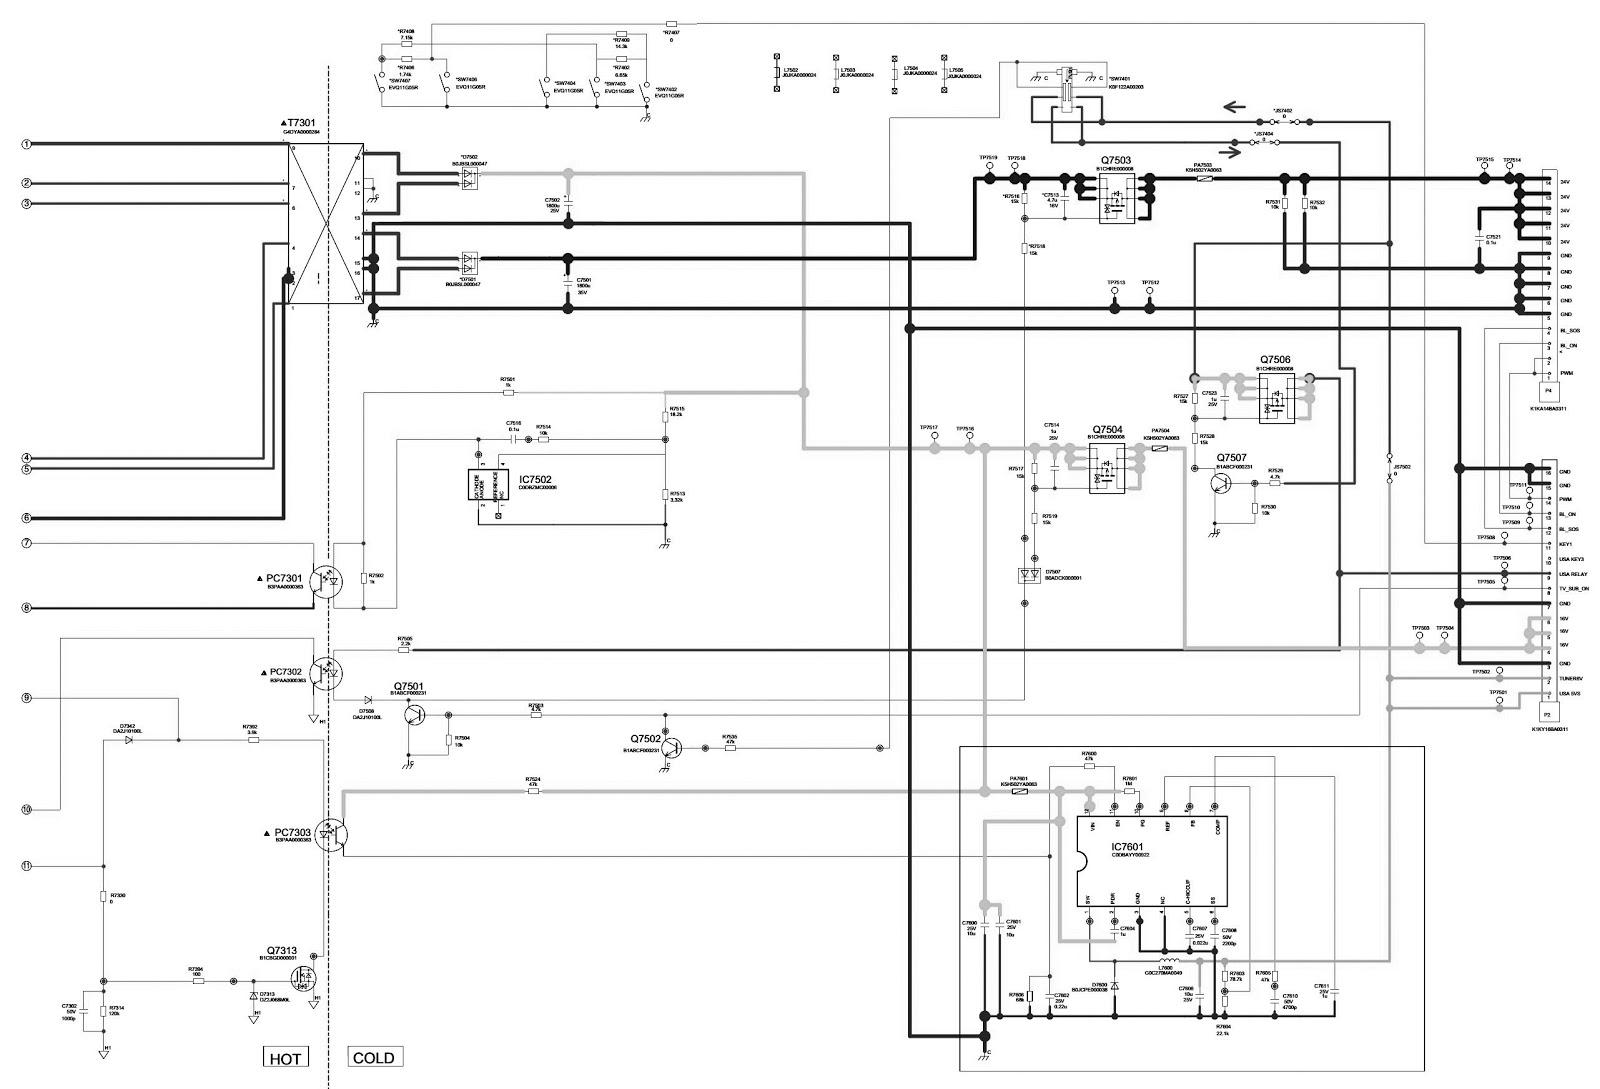 TNPA5364BJ  SMPS SCHEMATIC  PANASONIC TH L32X30C  LCD